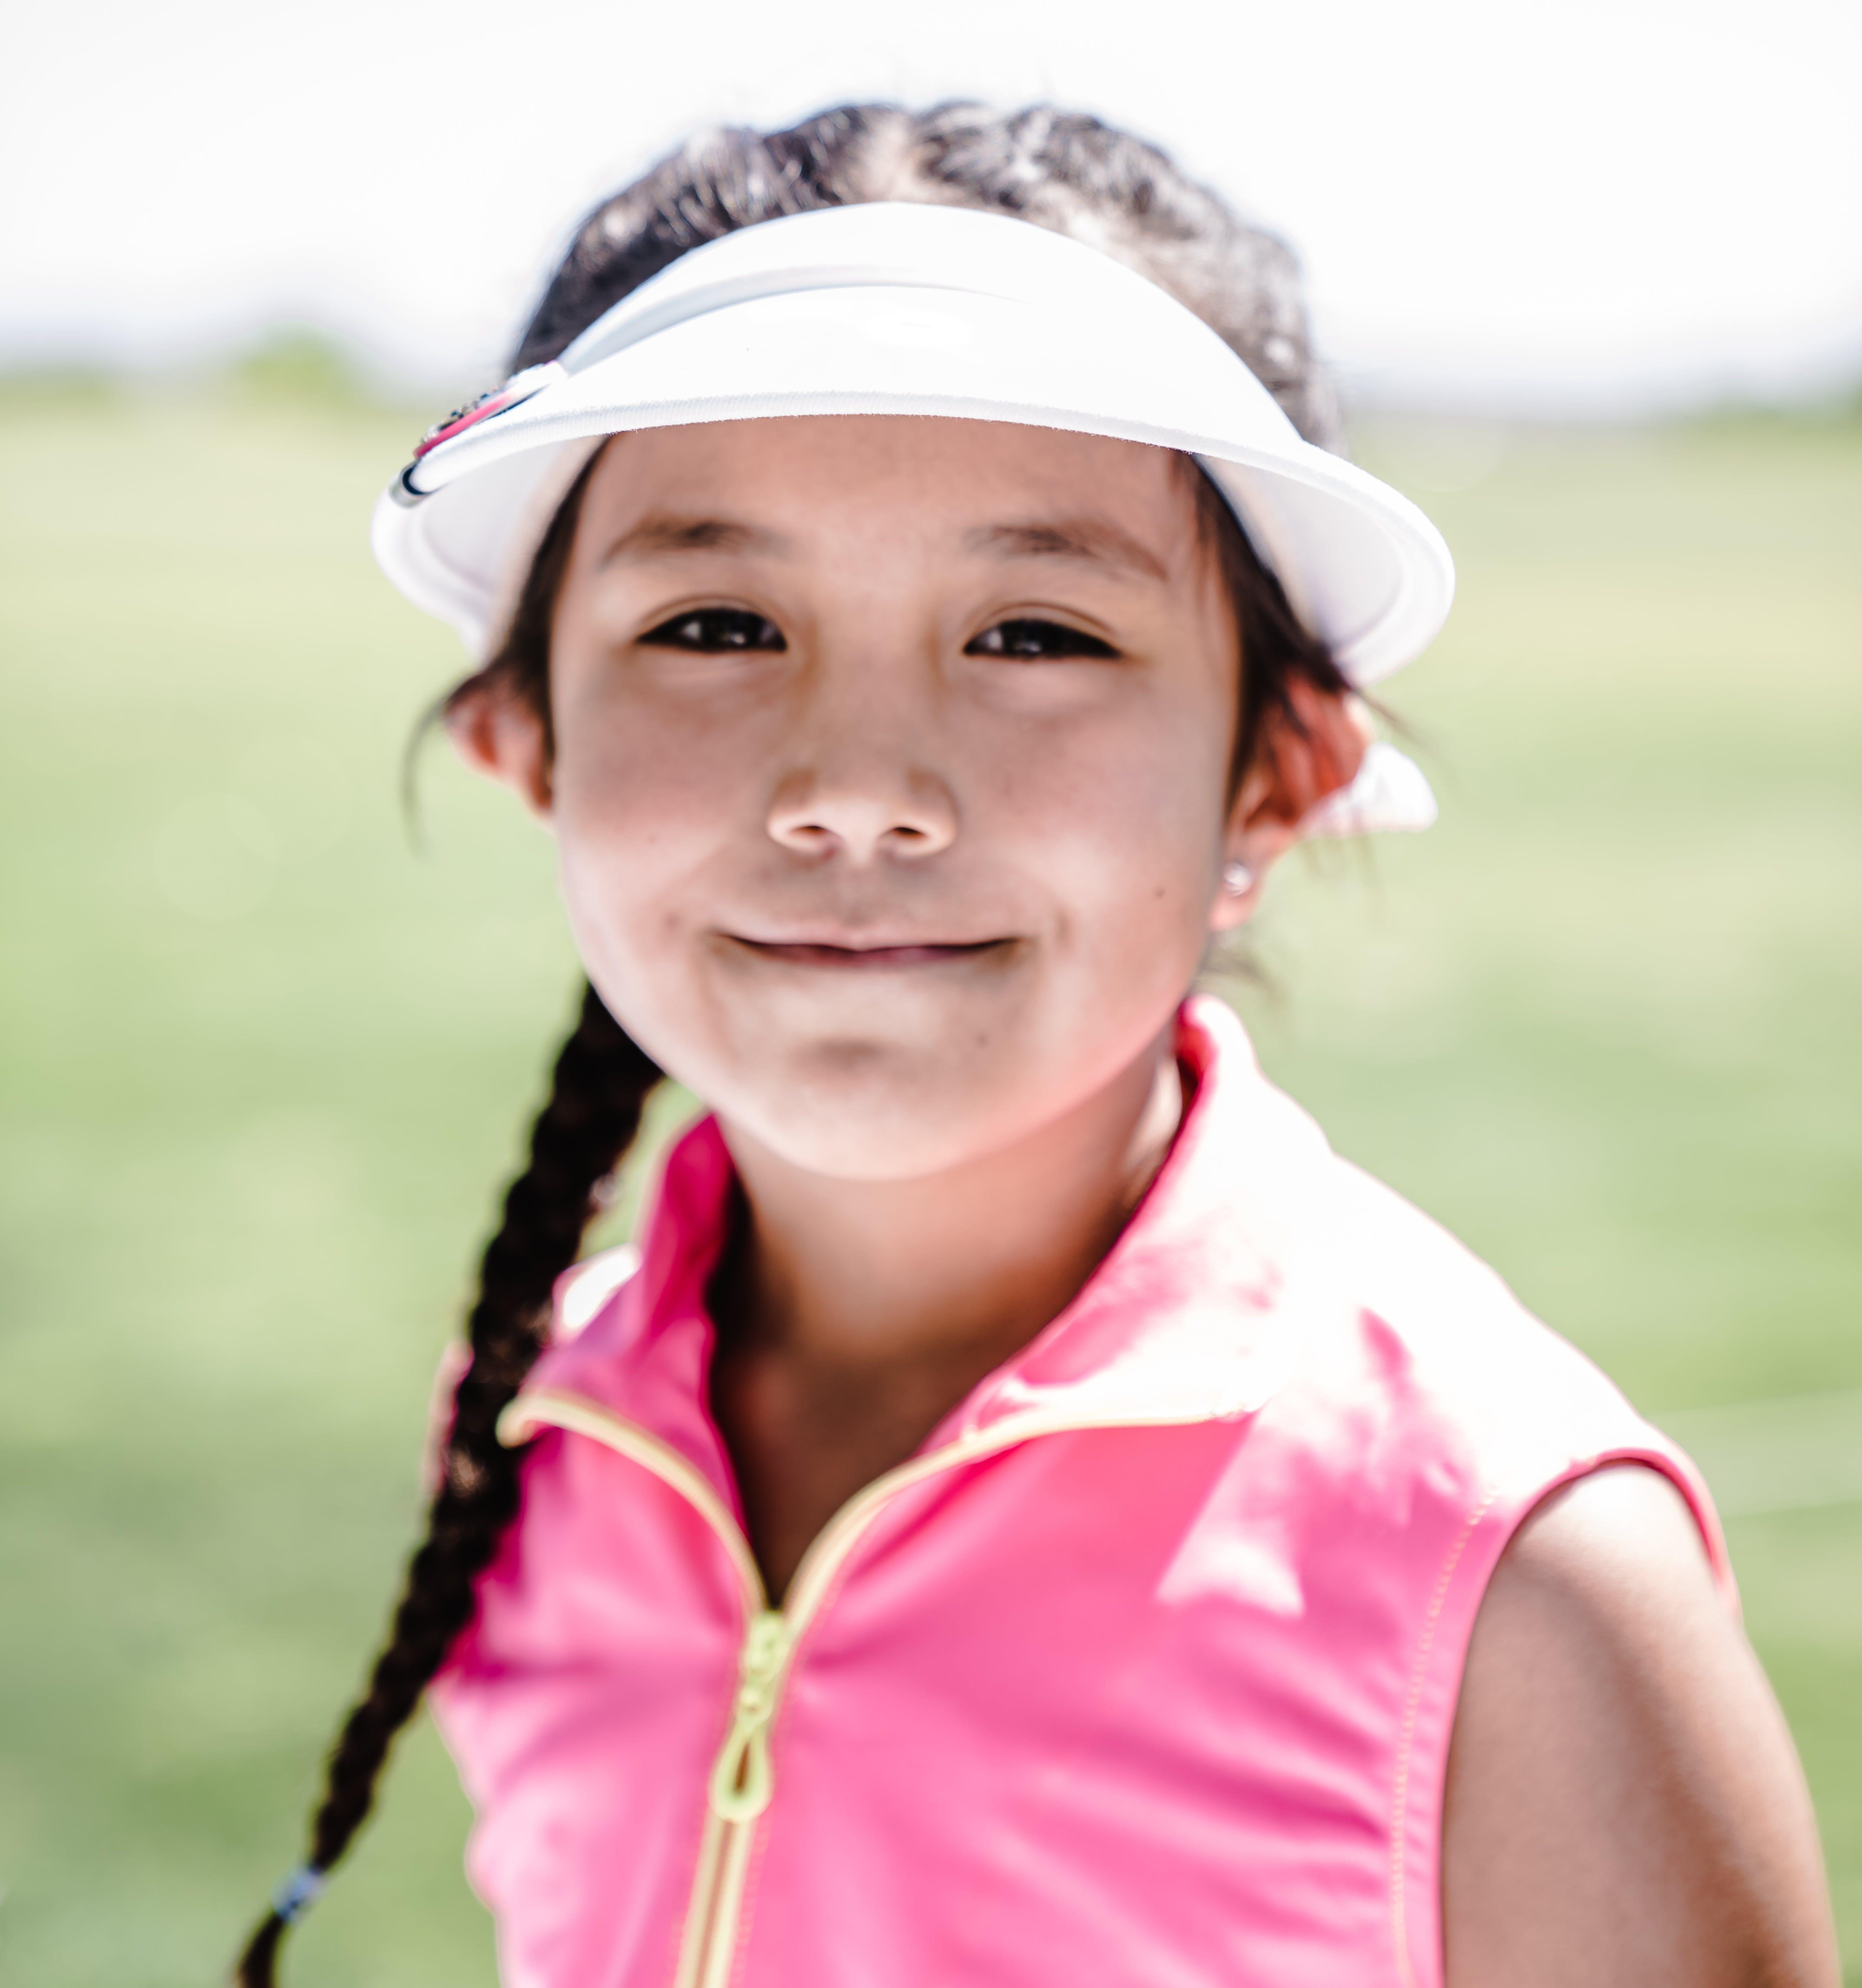 Girl Wearing White Visor Hat And Pink Zip-up Vest